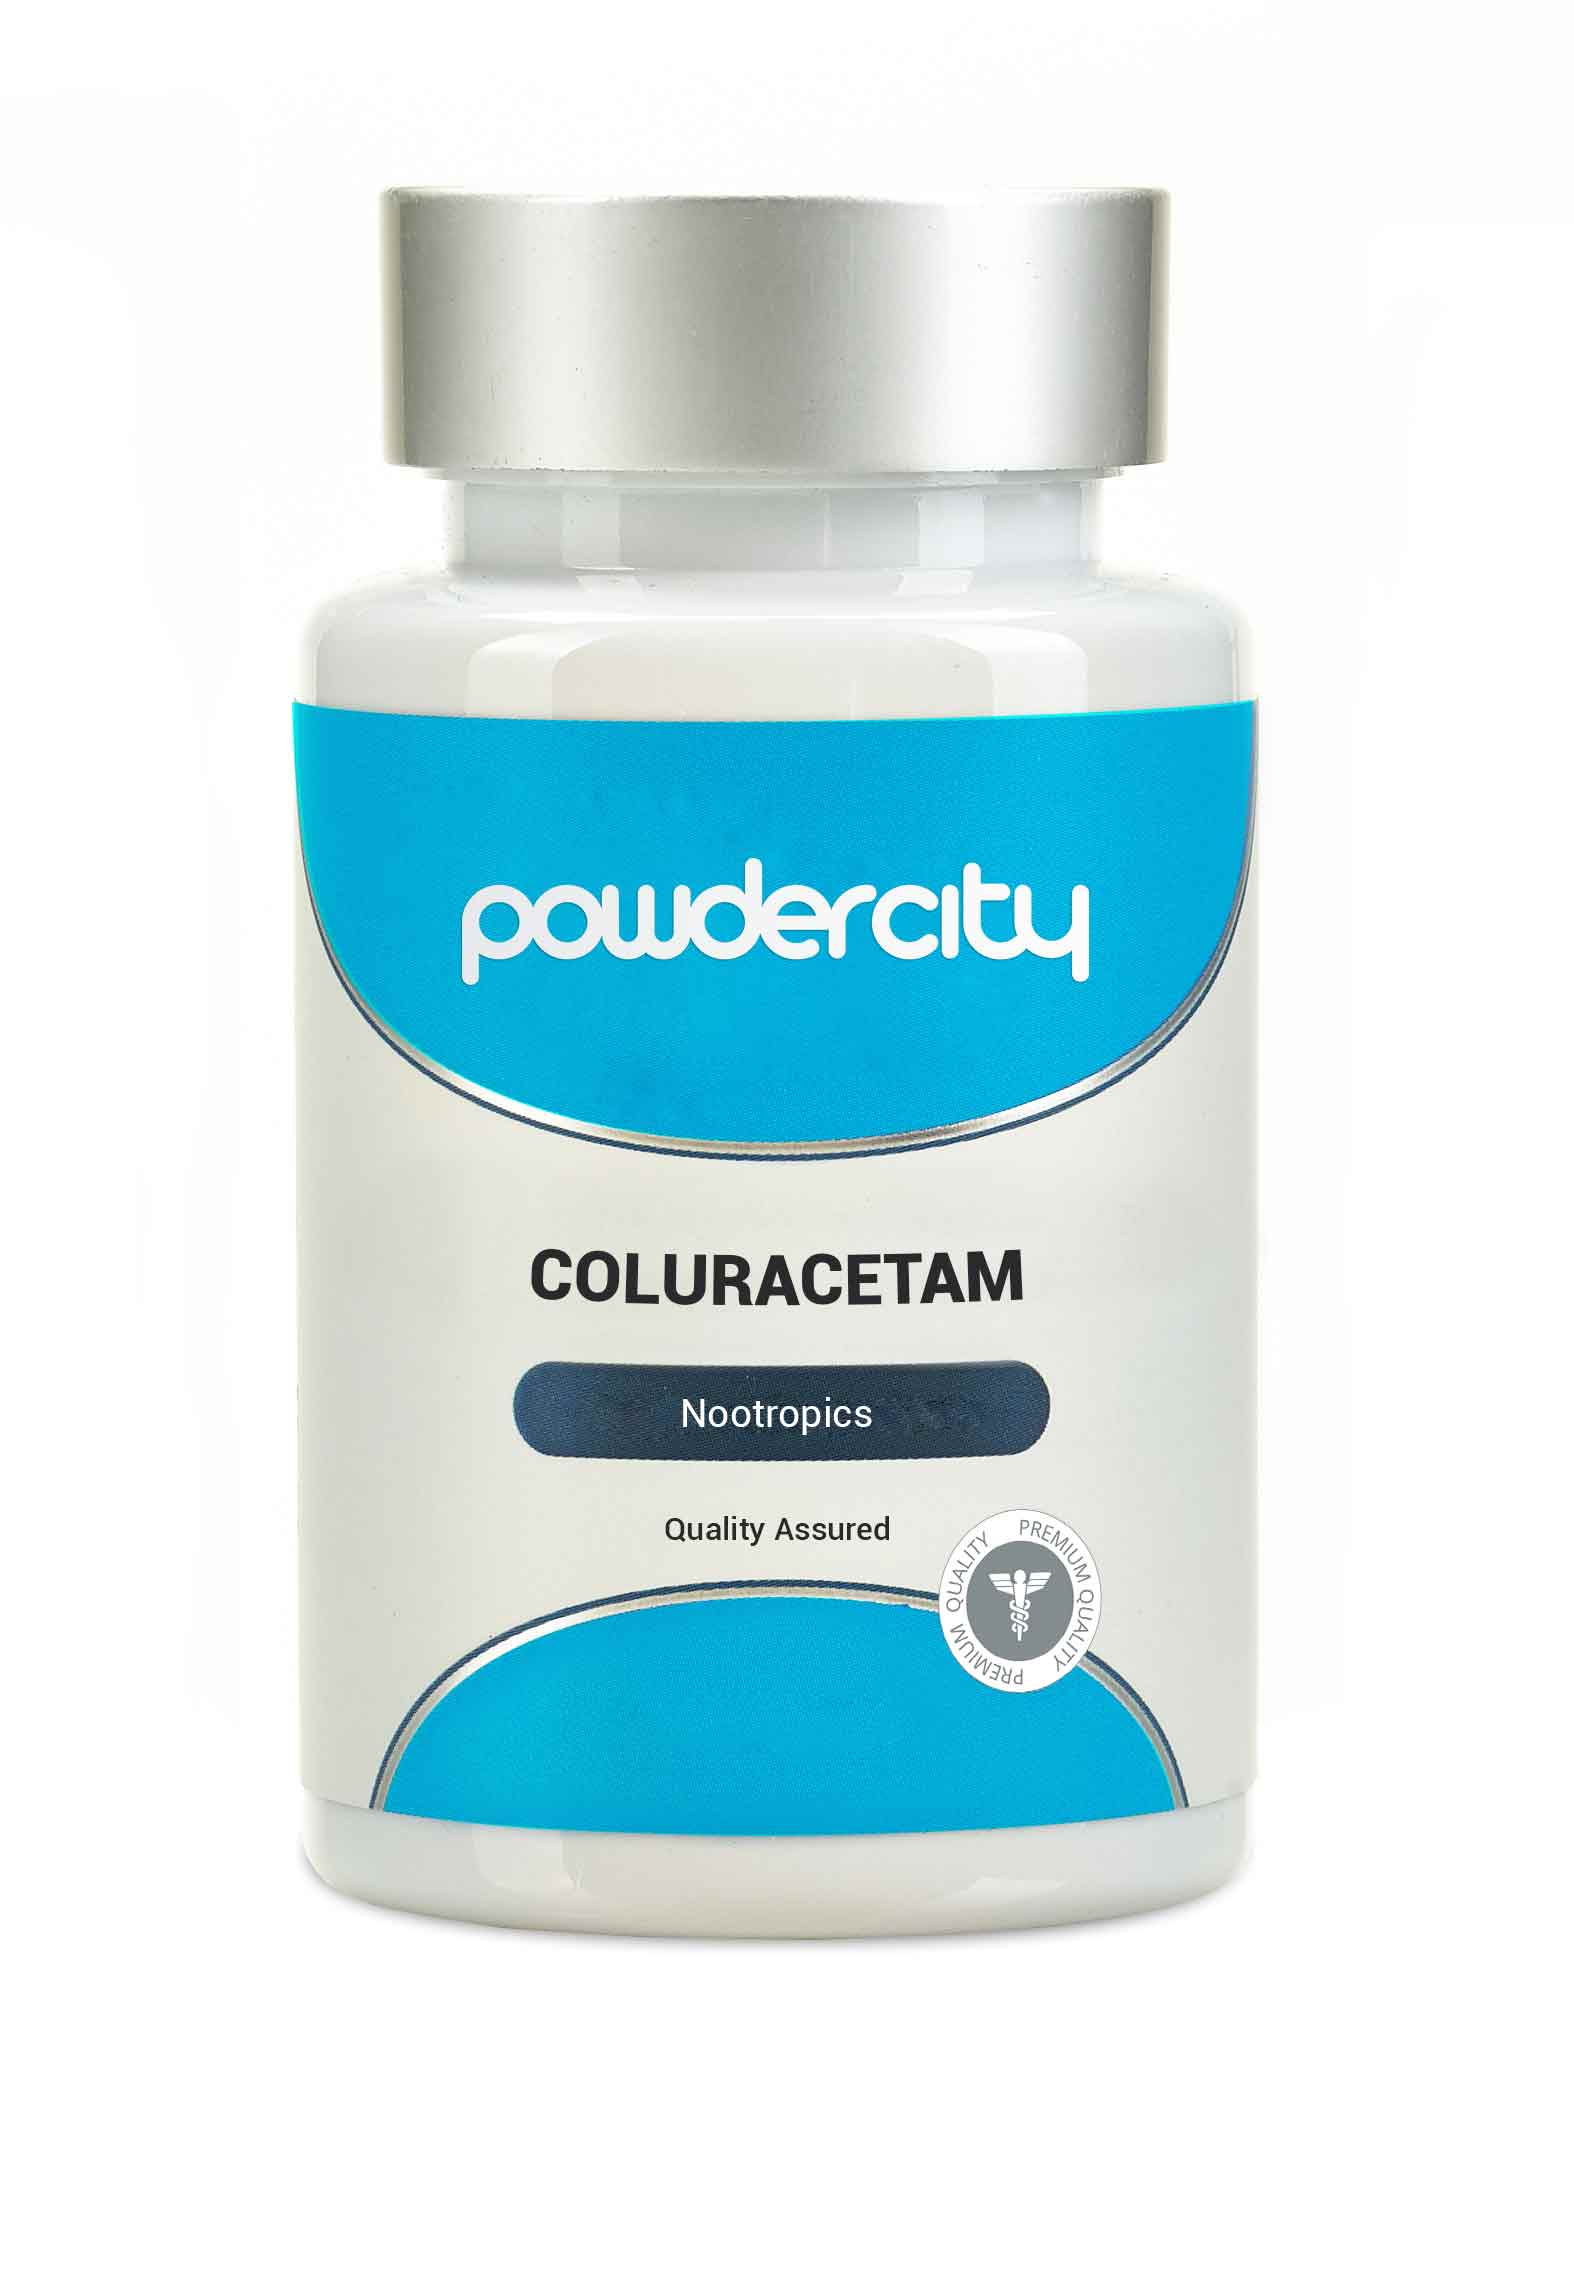 Coluracetam Online Dosage Side Effects Benefits Science